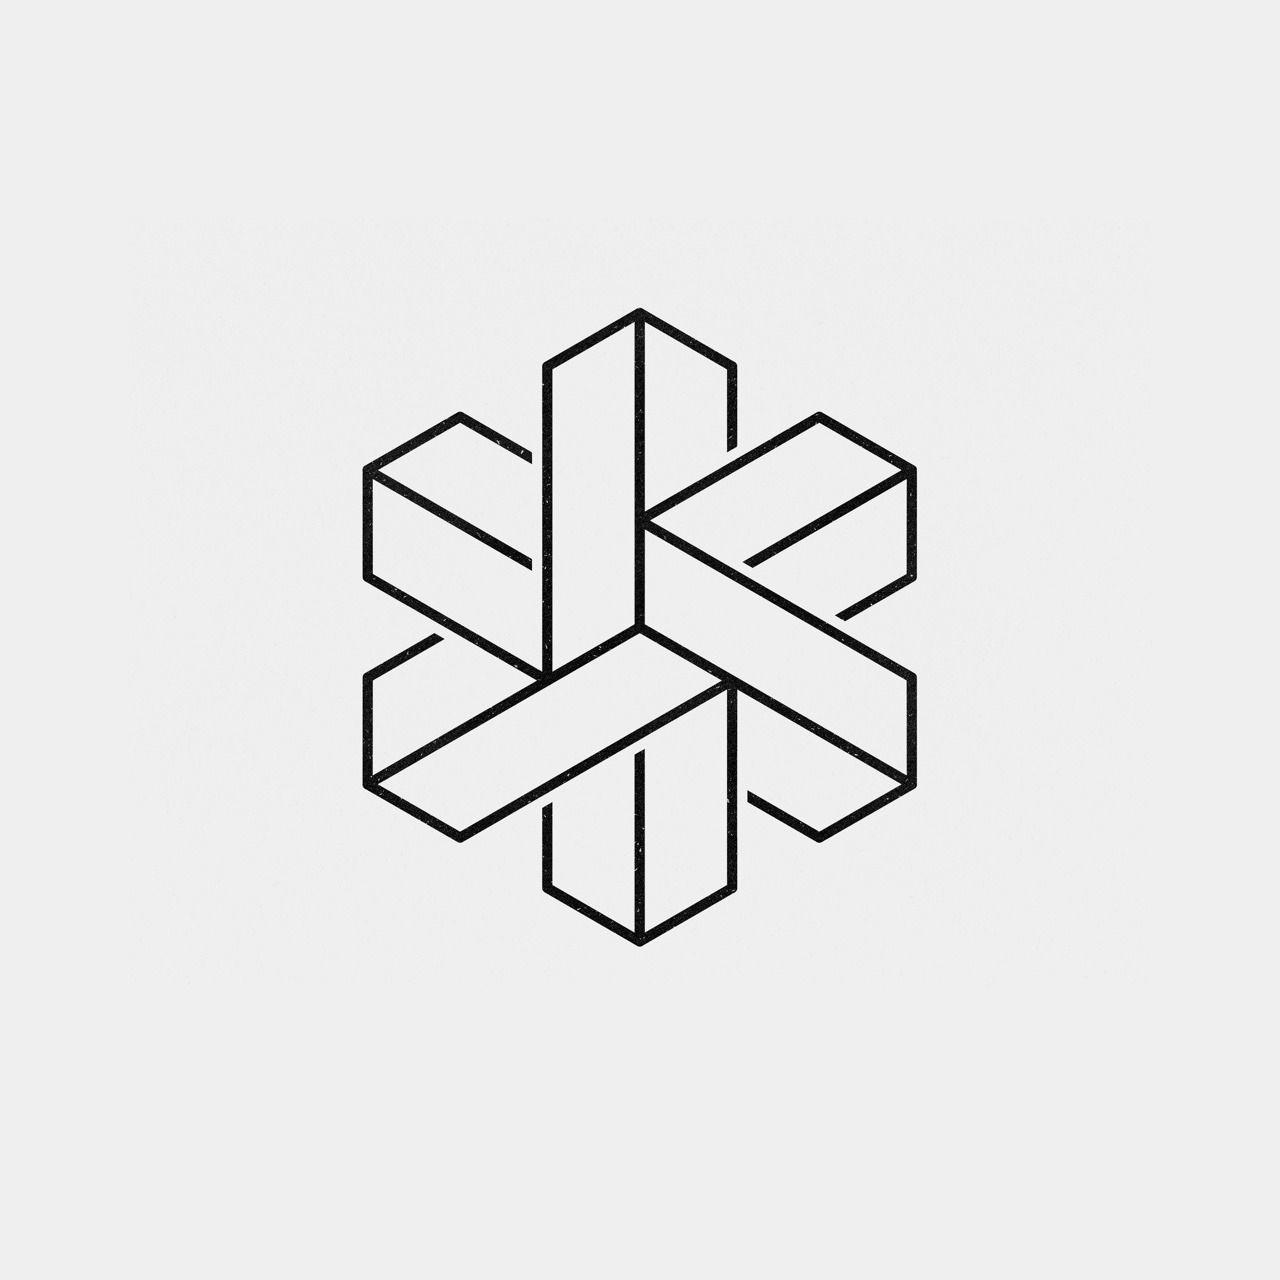 Art Of Geometry Art Abstract Minimalism Shapes Geometric Geometry Aesthetic Tattoo Inspiration Black And W Geometric Drawing Geometric Logo Geometric